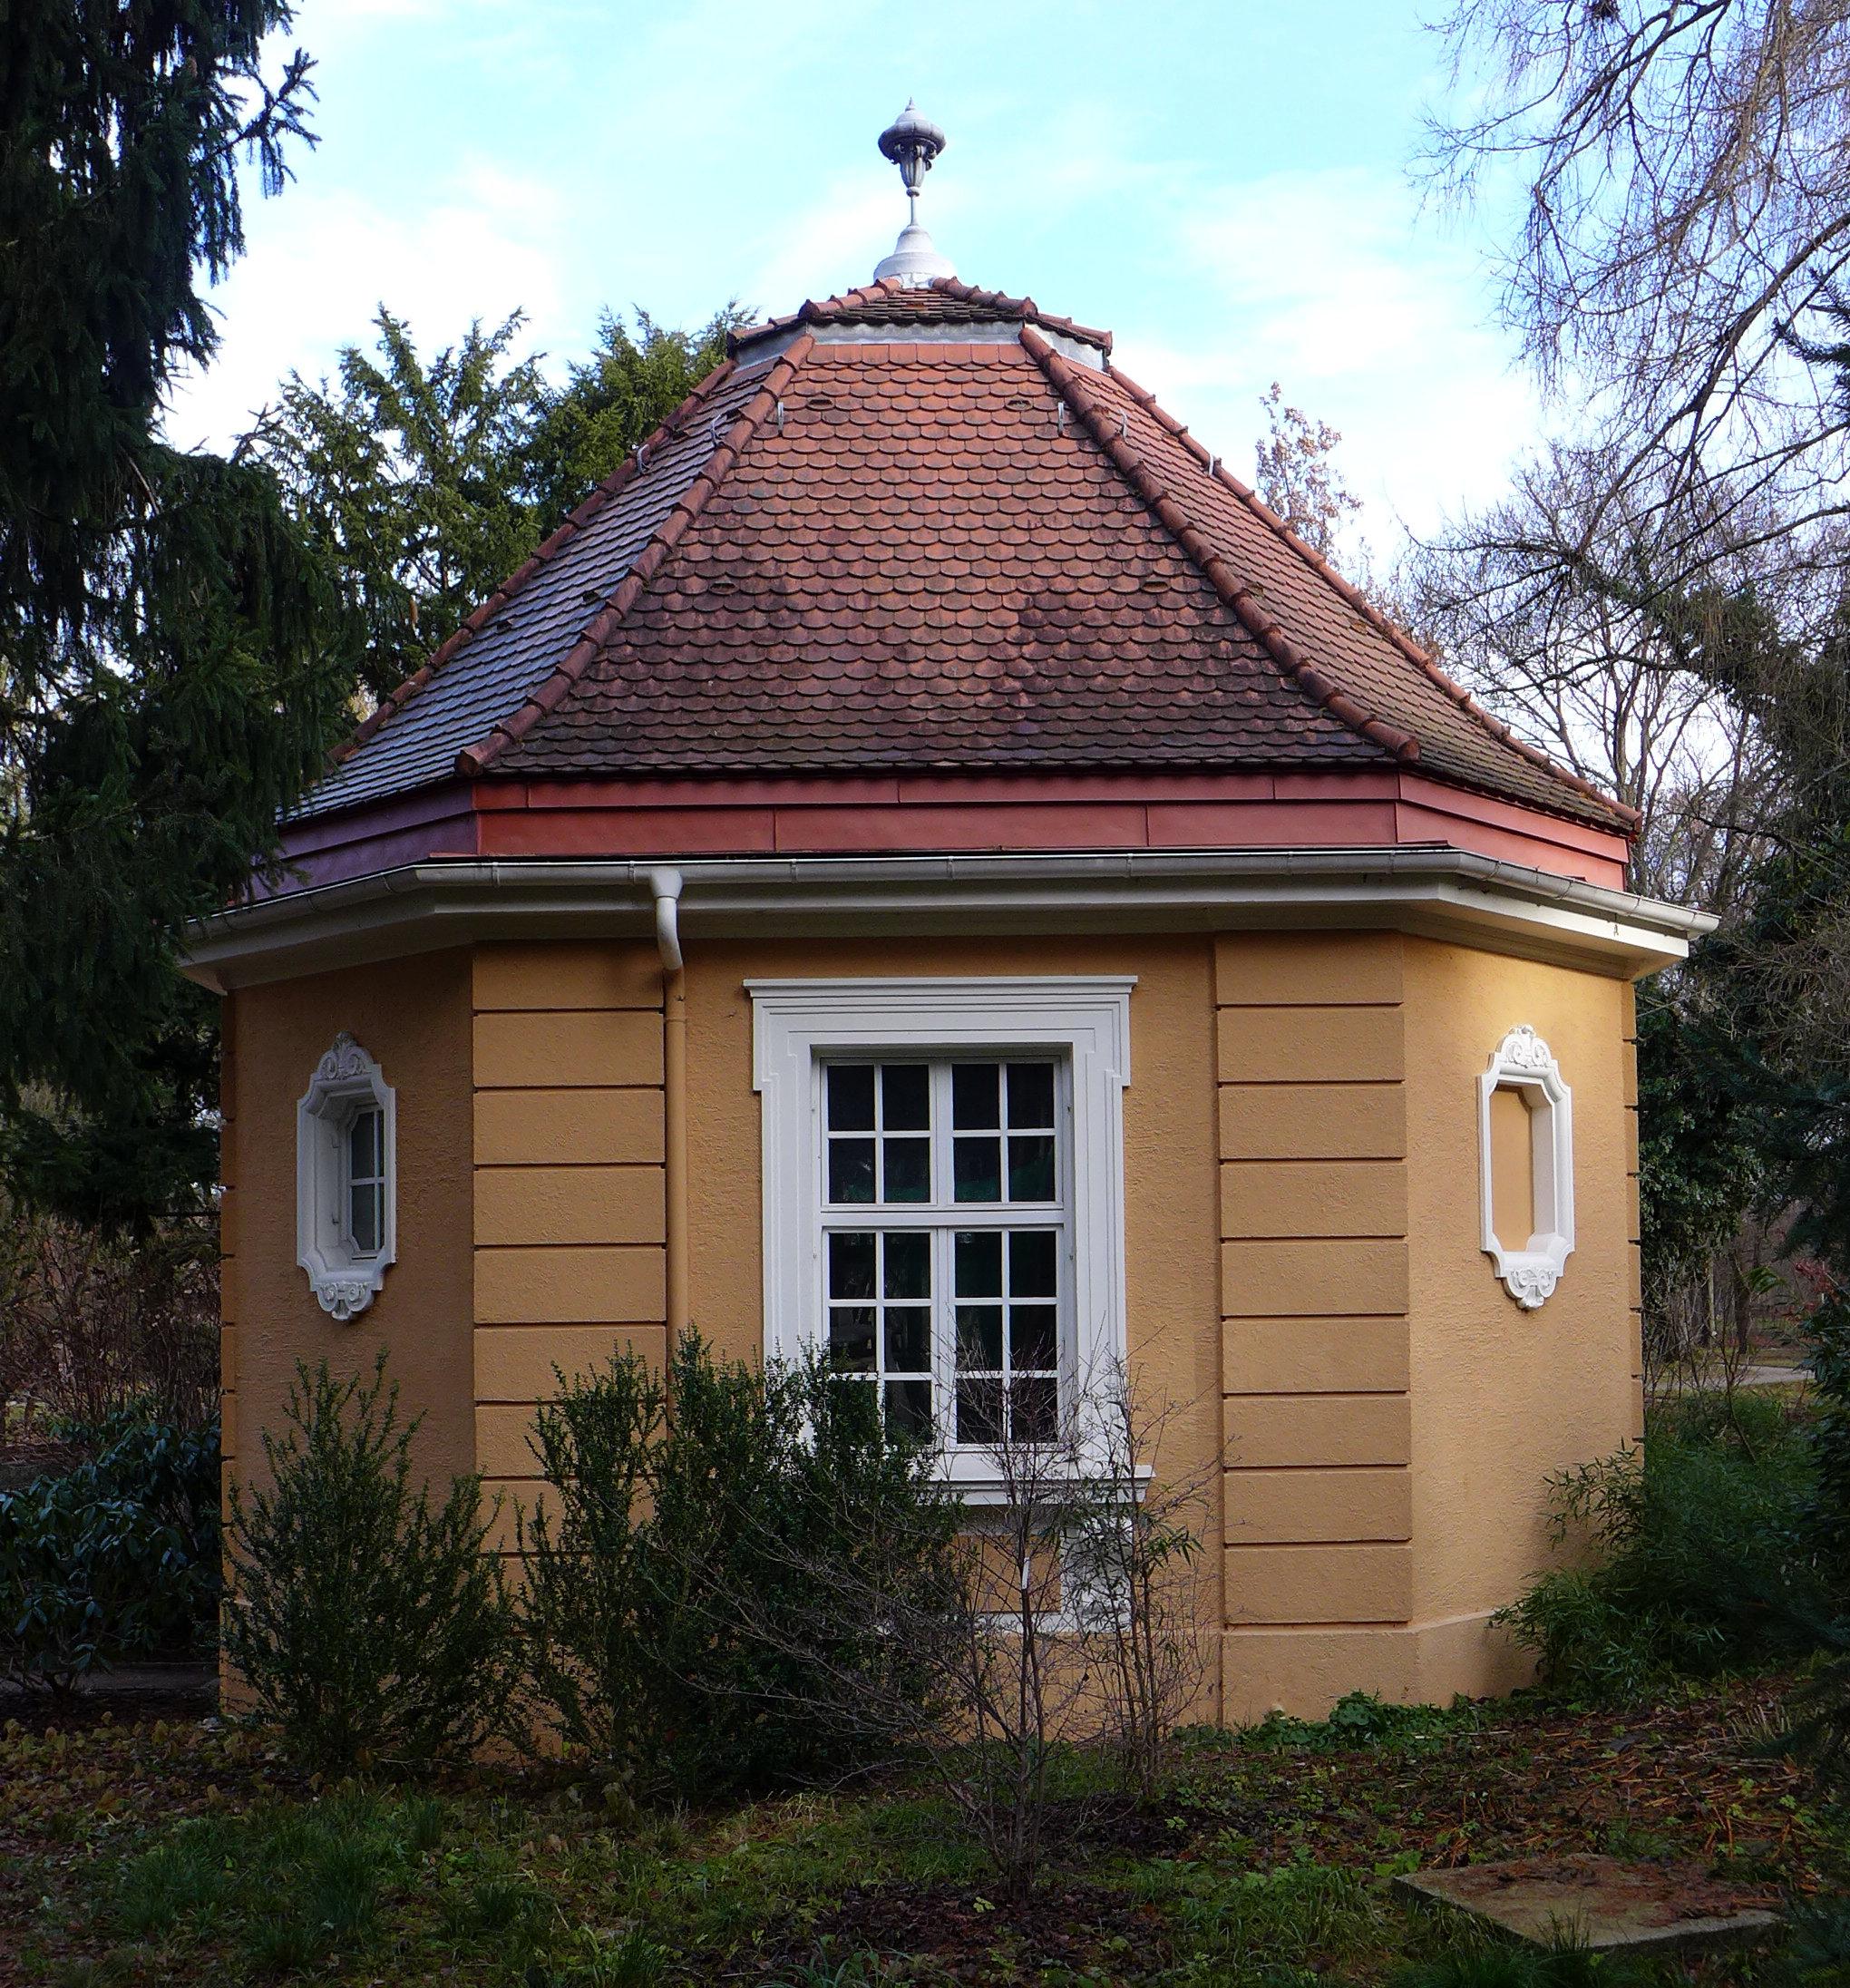 Filepumpenhaus Botanischergarten Münchenjpg Wikimedia Commons